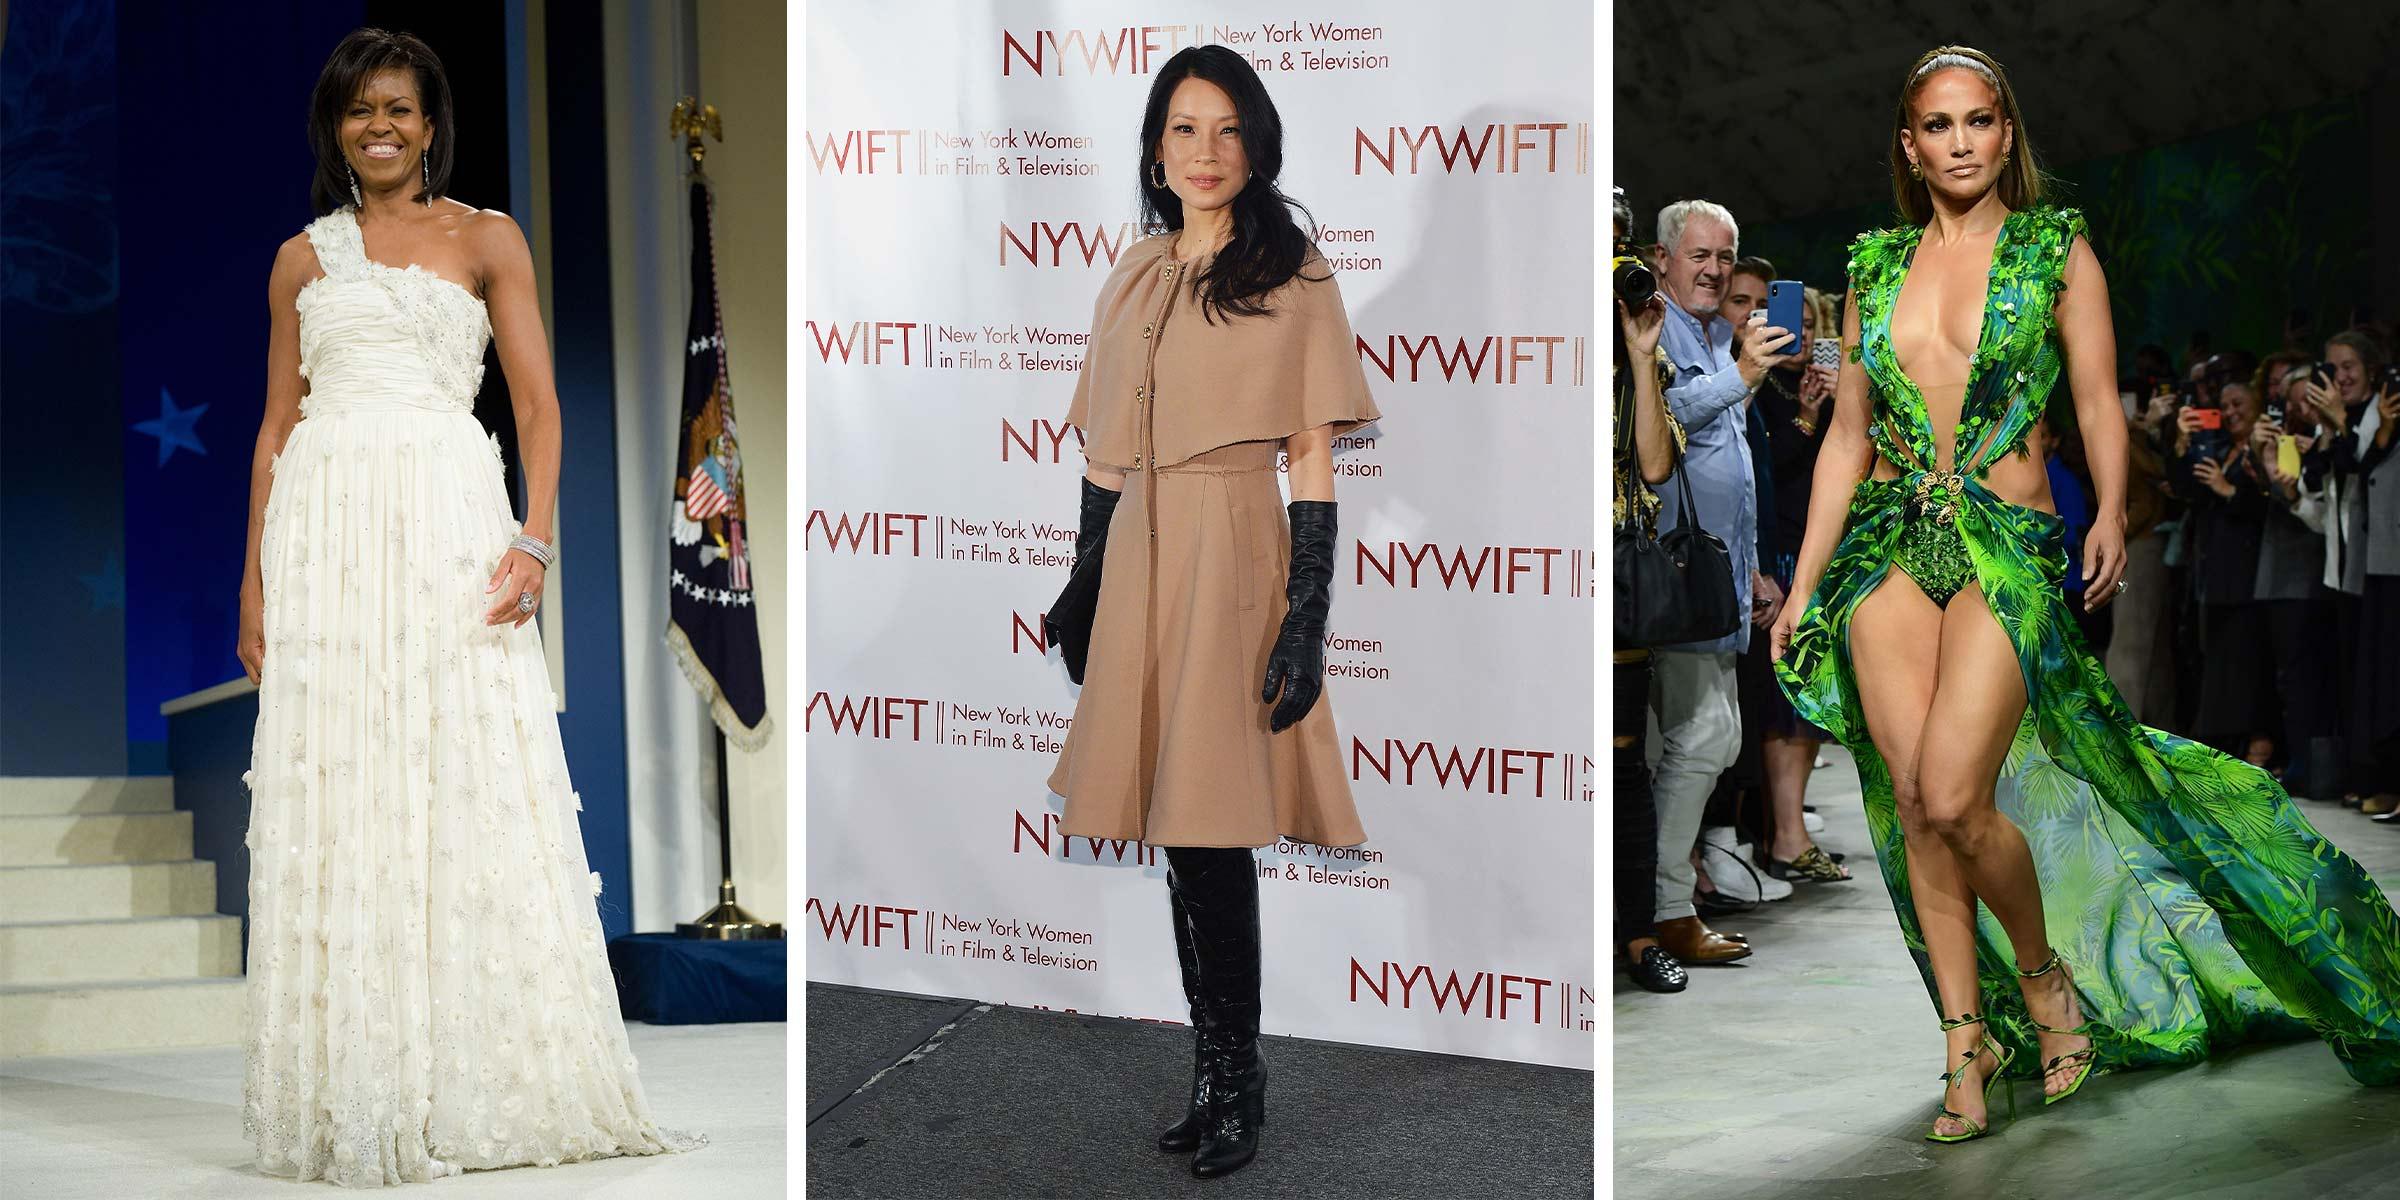 Michelle Obama, Lucy Liu and Jennifer Lopez featured